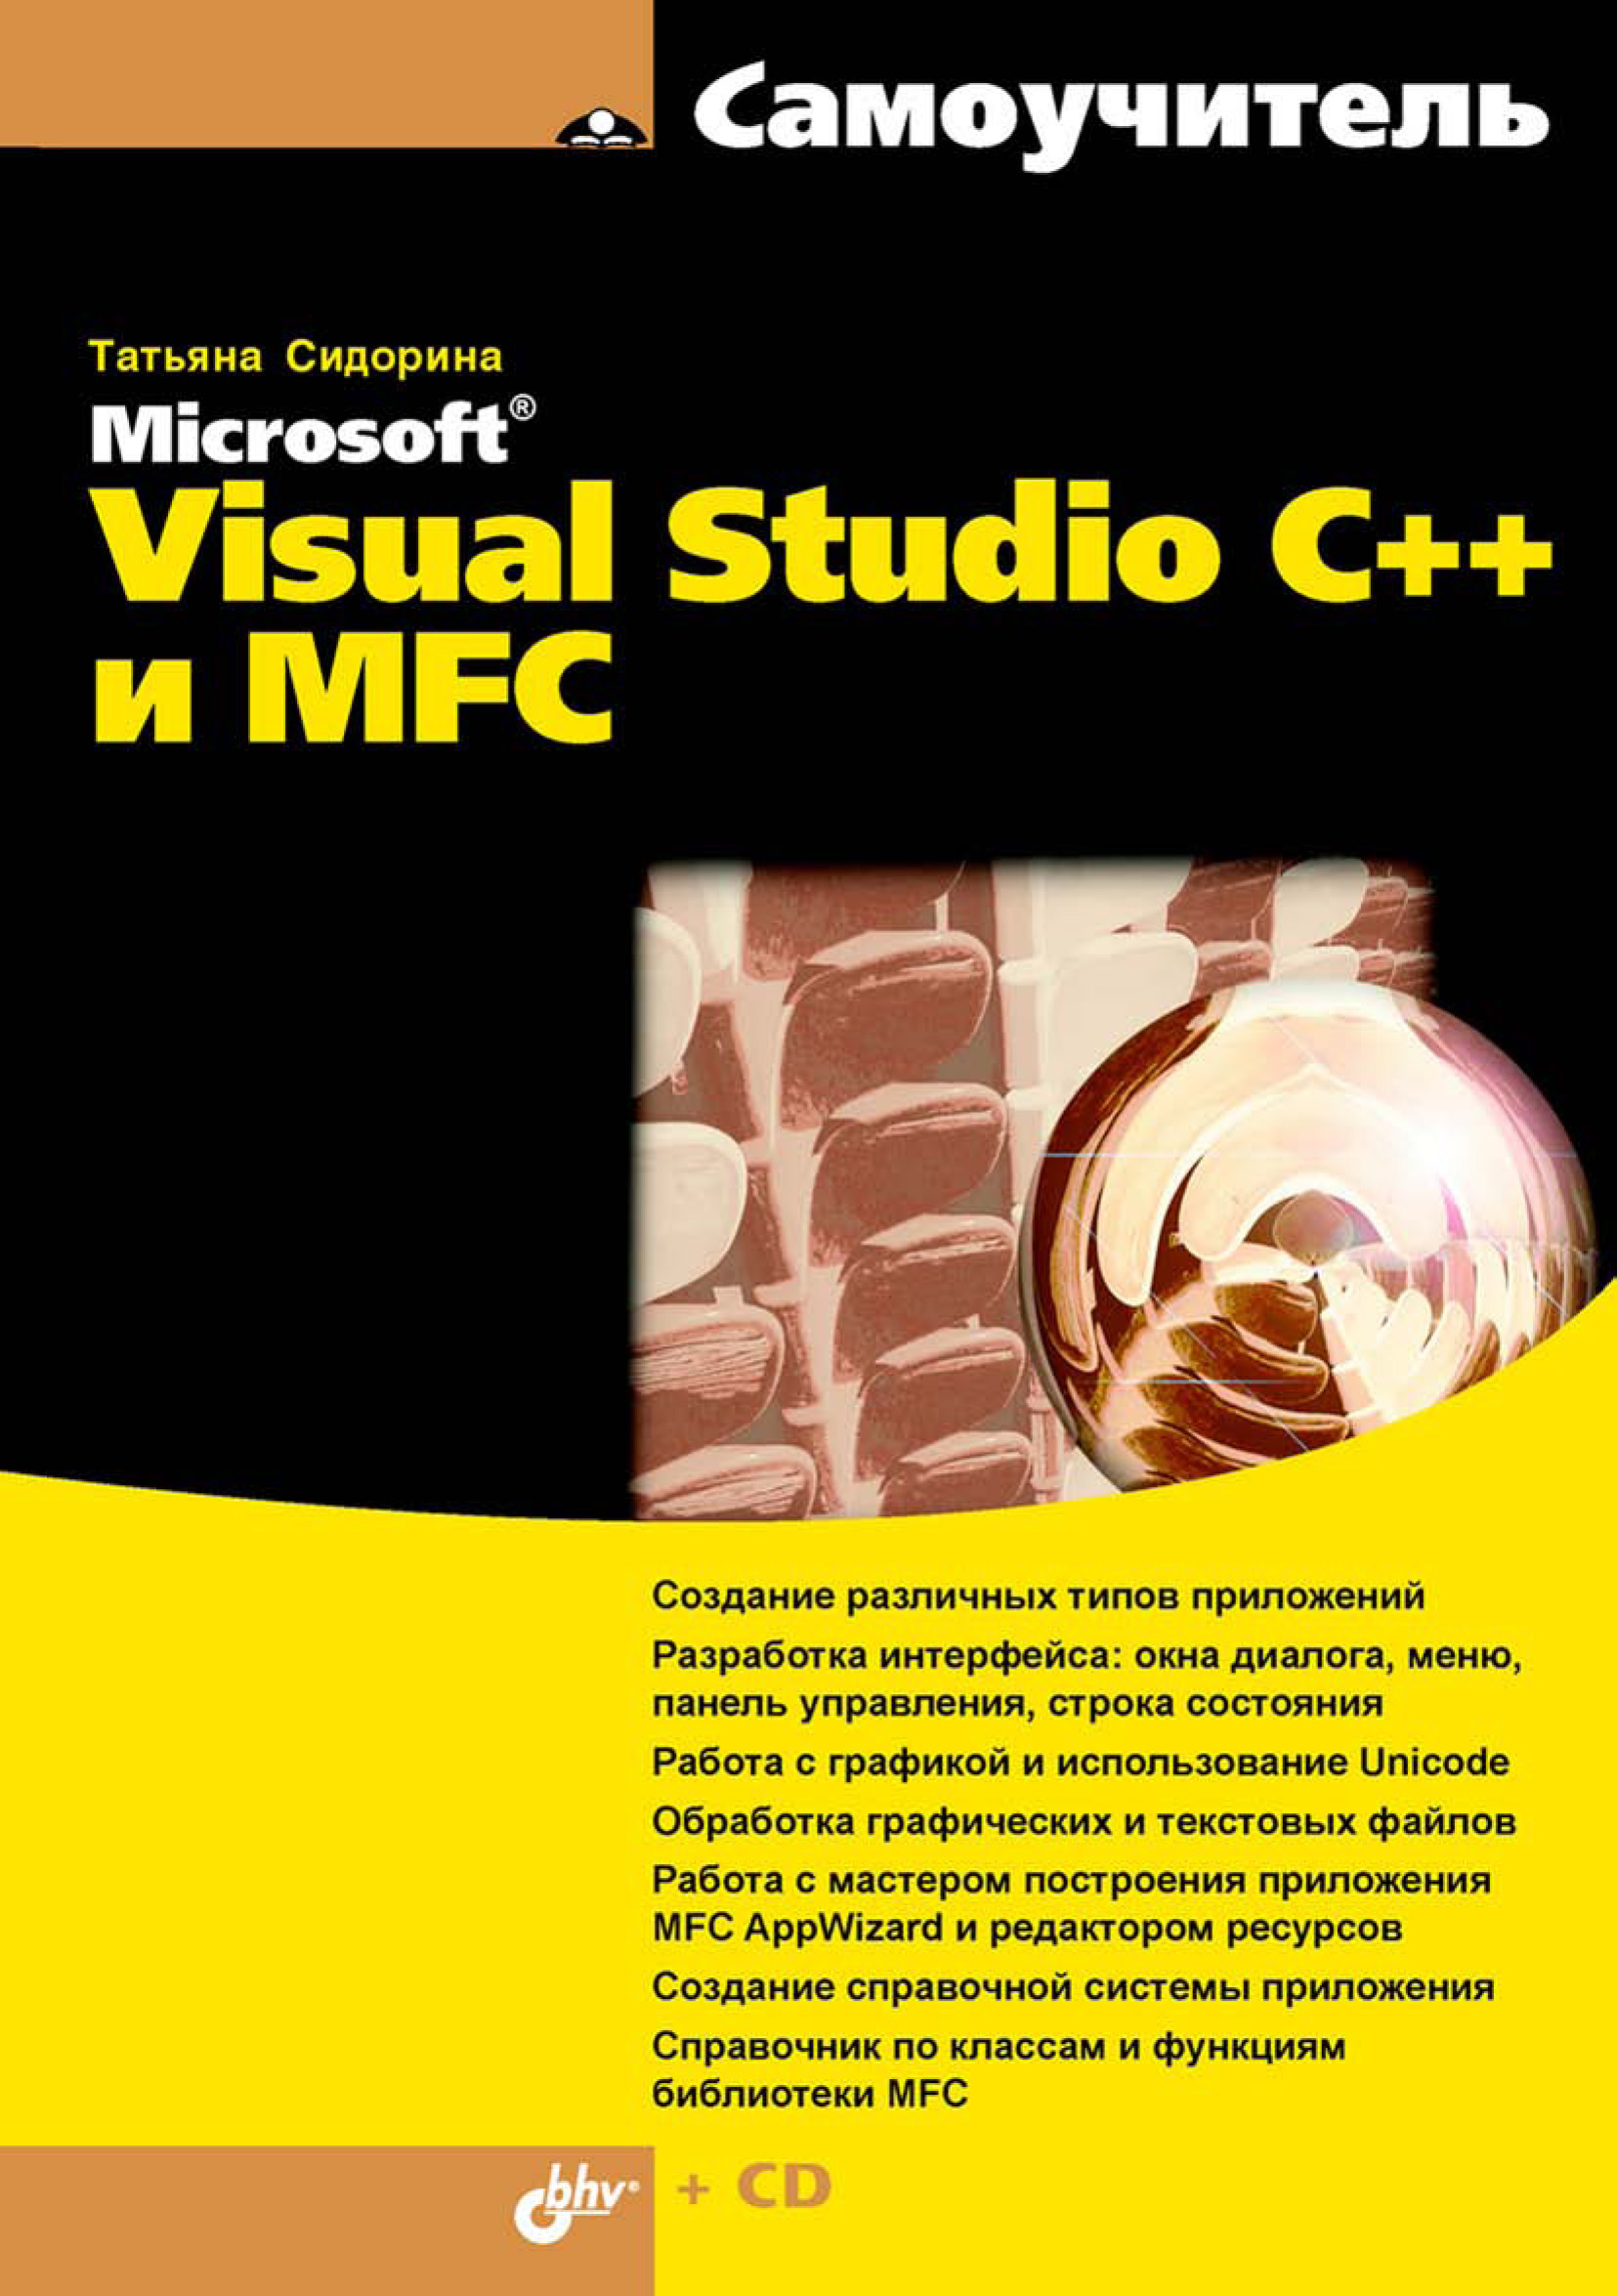 Татьяна Сидорина Самоучитель Microsoft Visual Studio C++ и MFC тихомиров юрий мешков александр visual c и mfc